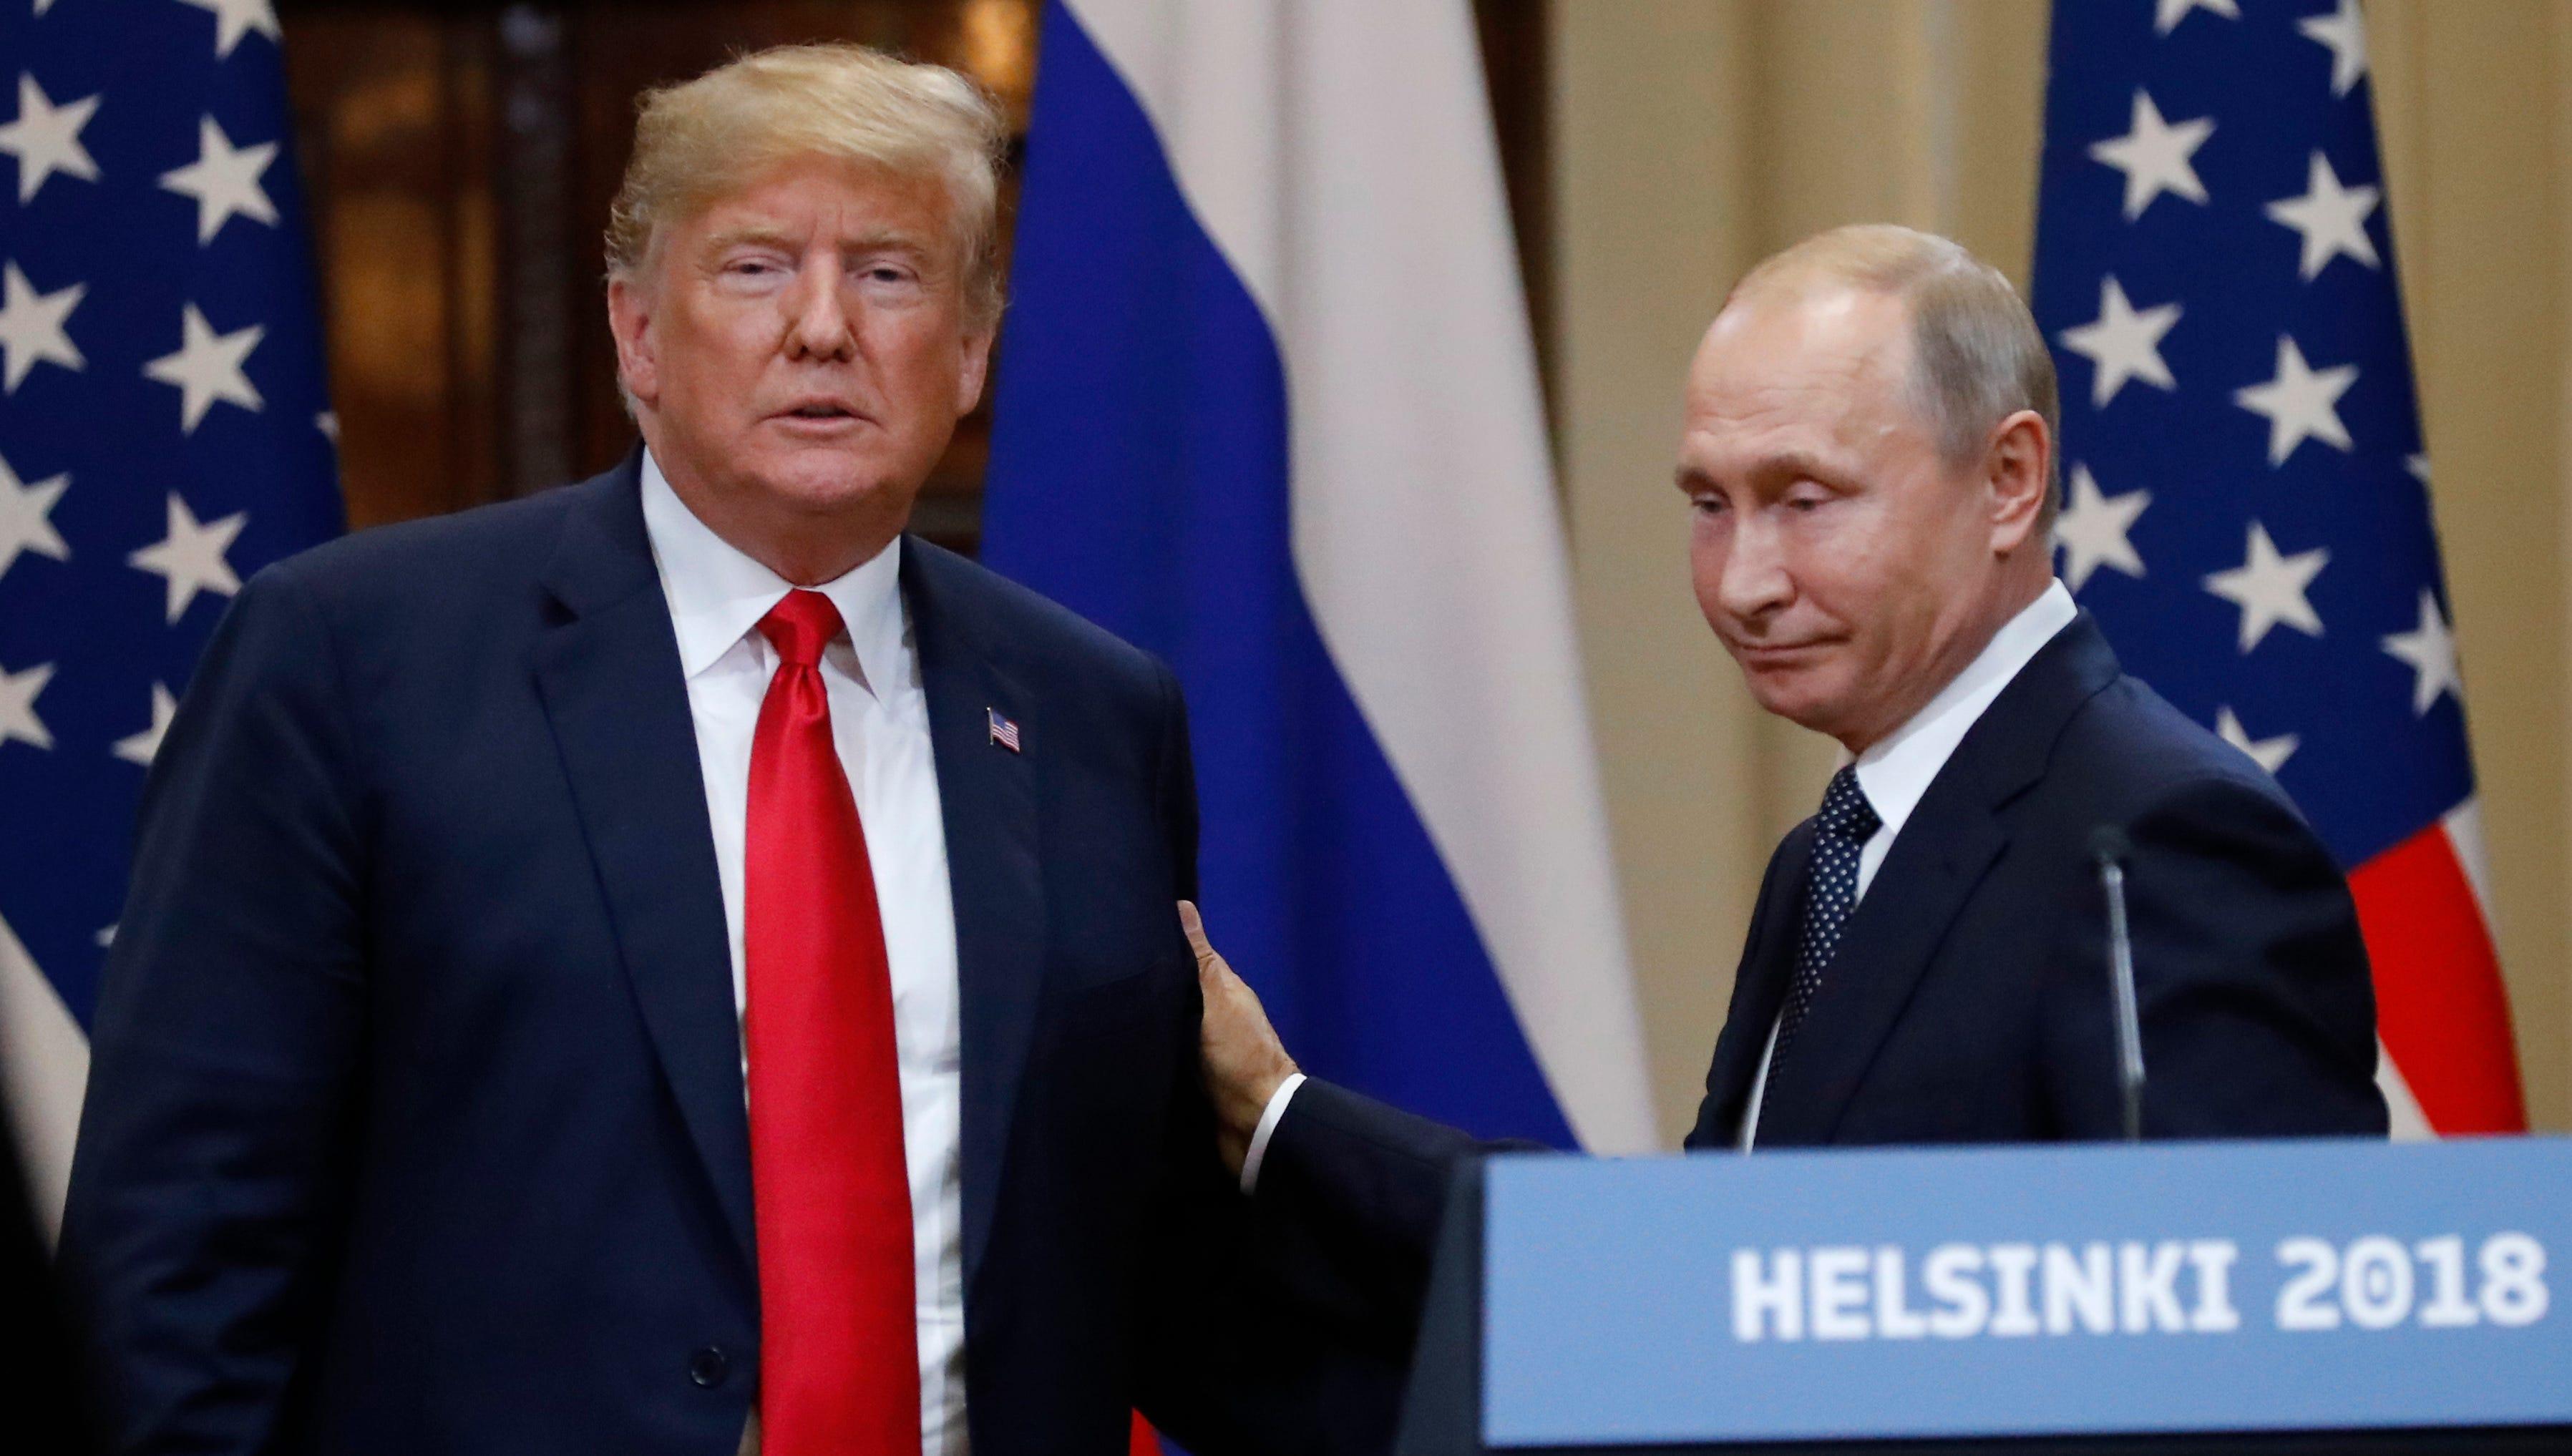 U.S. President Donald Trump and Russian President Vladimir Putin during their meeting in Helsinki in July.